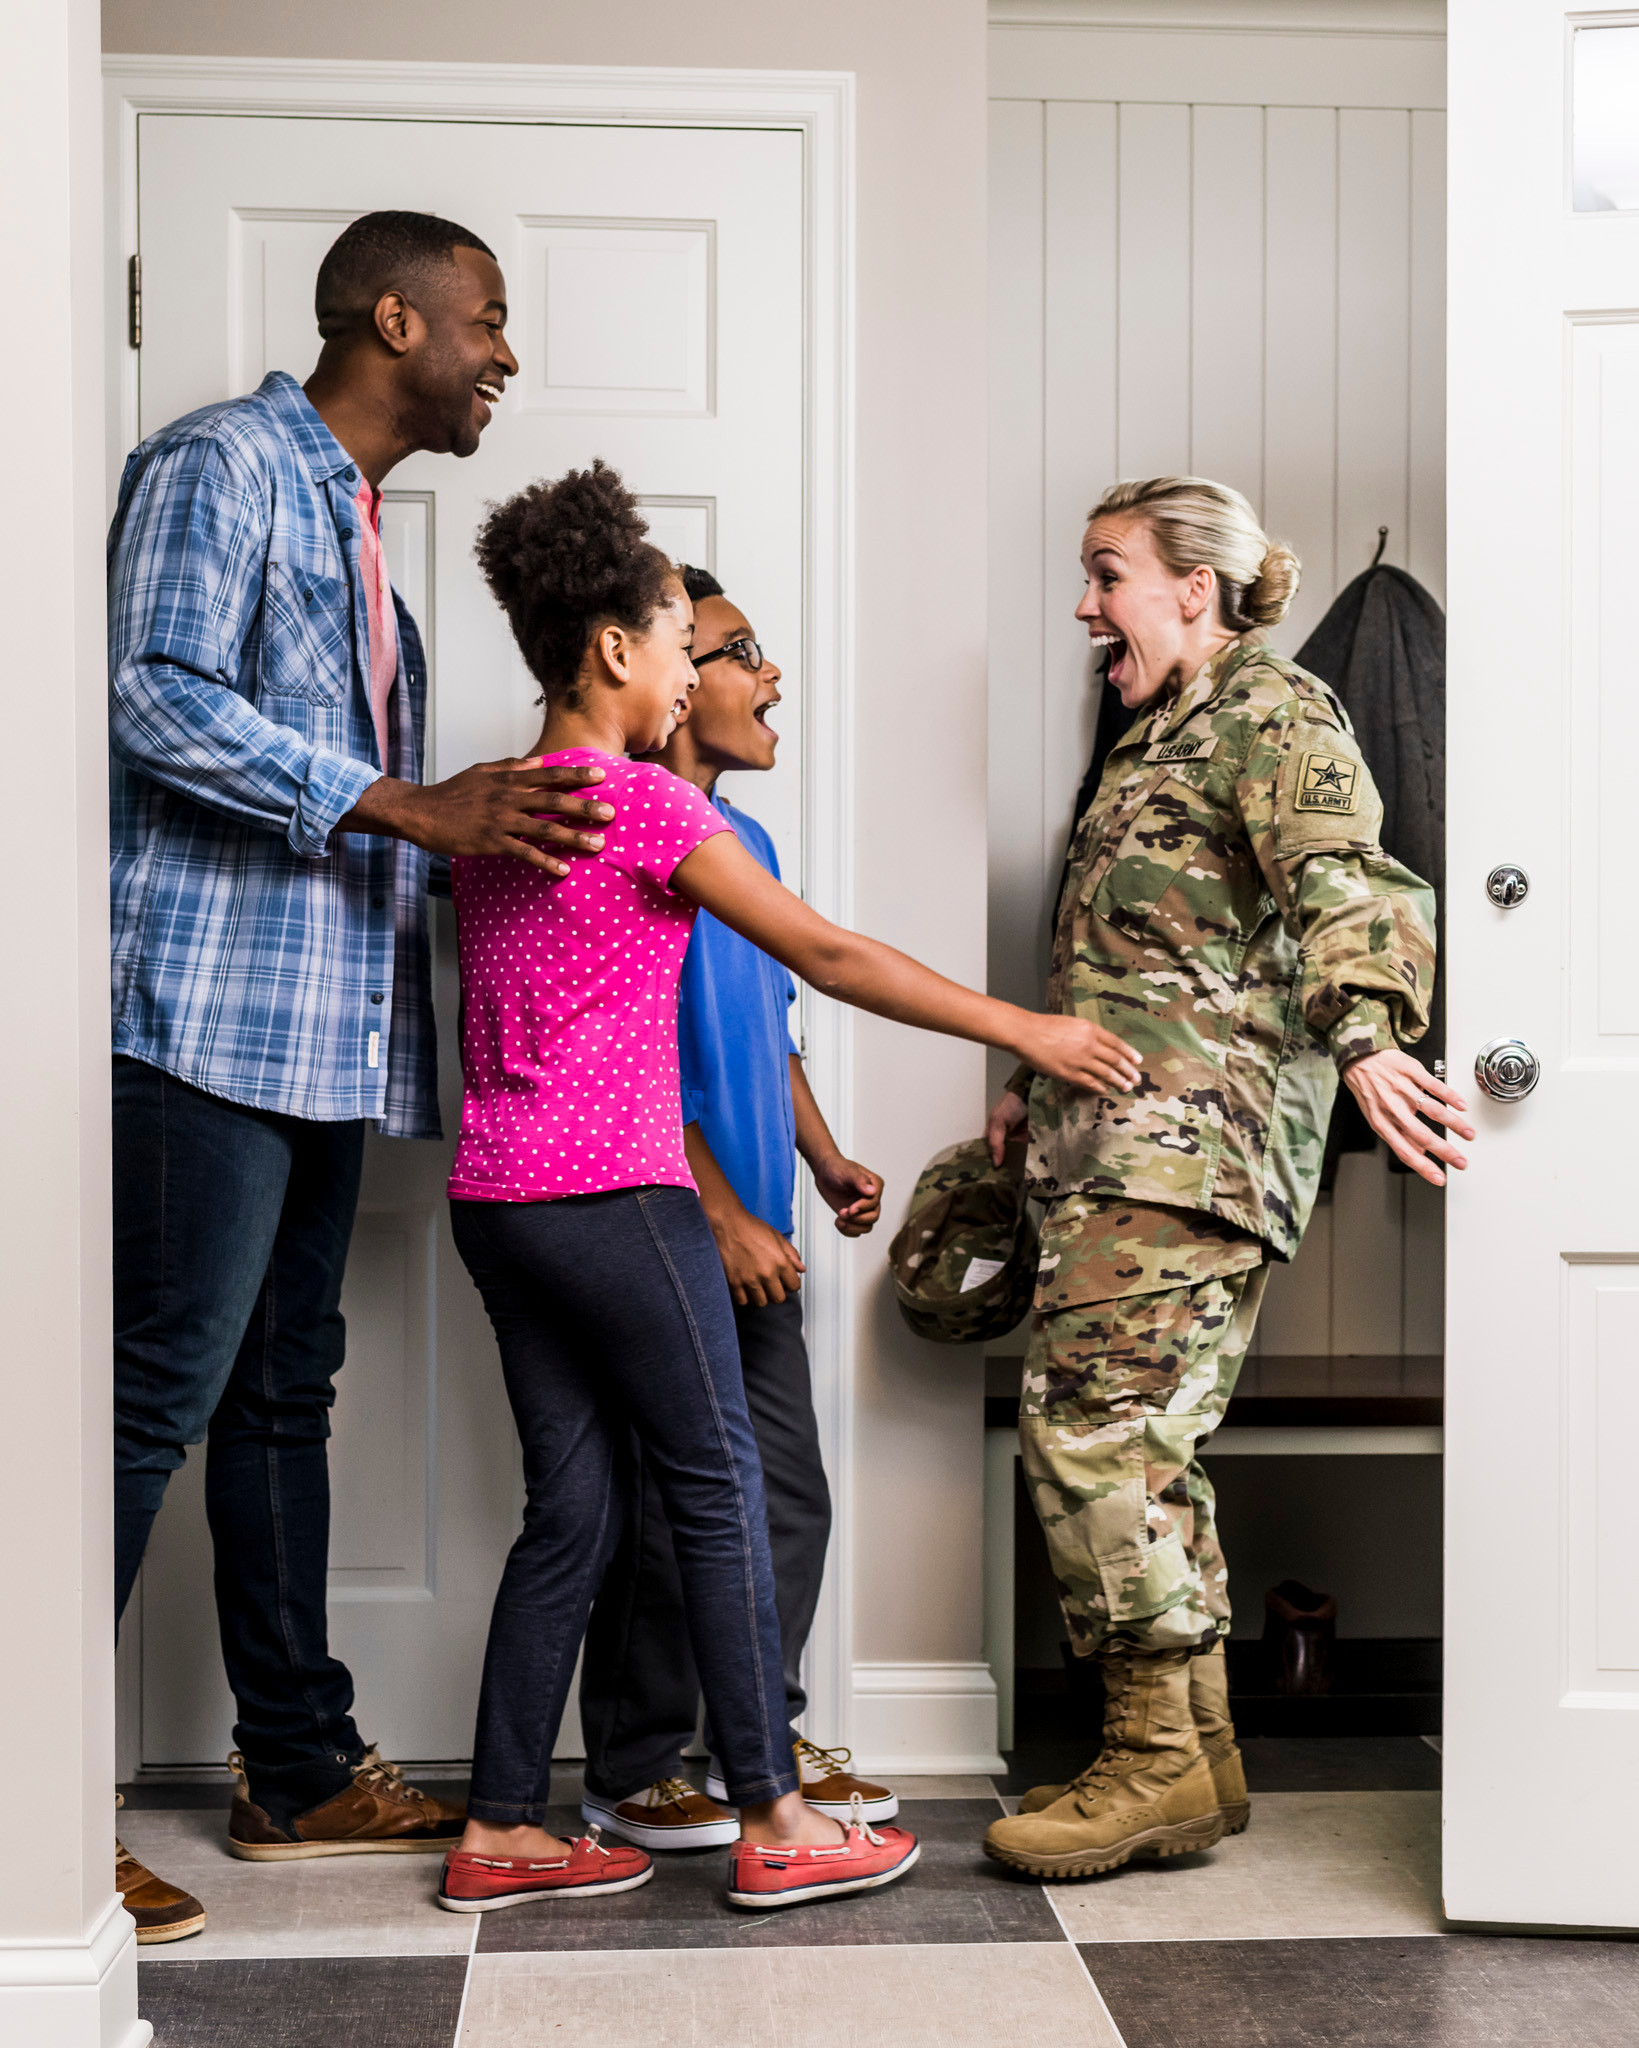 20180613_USBank_Military_Home_284.jpg